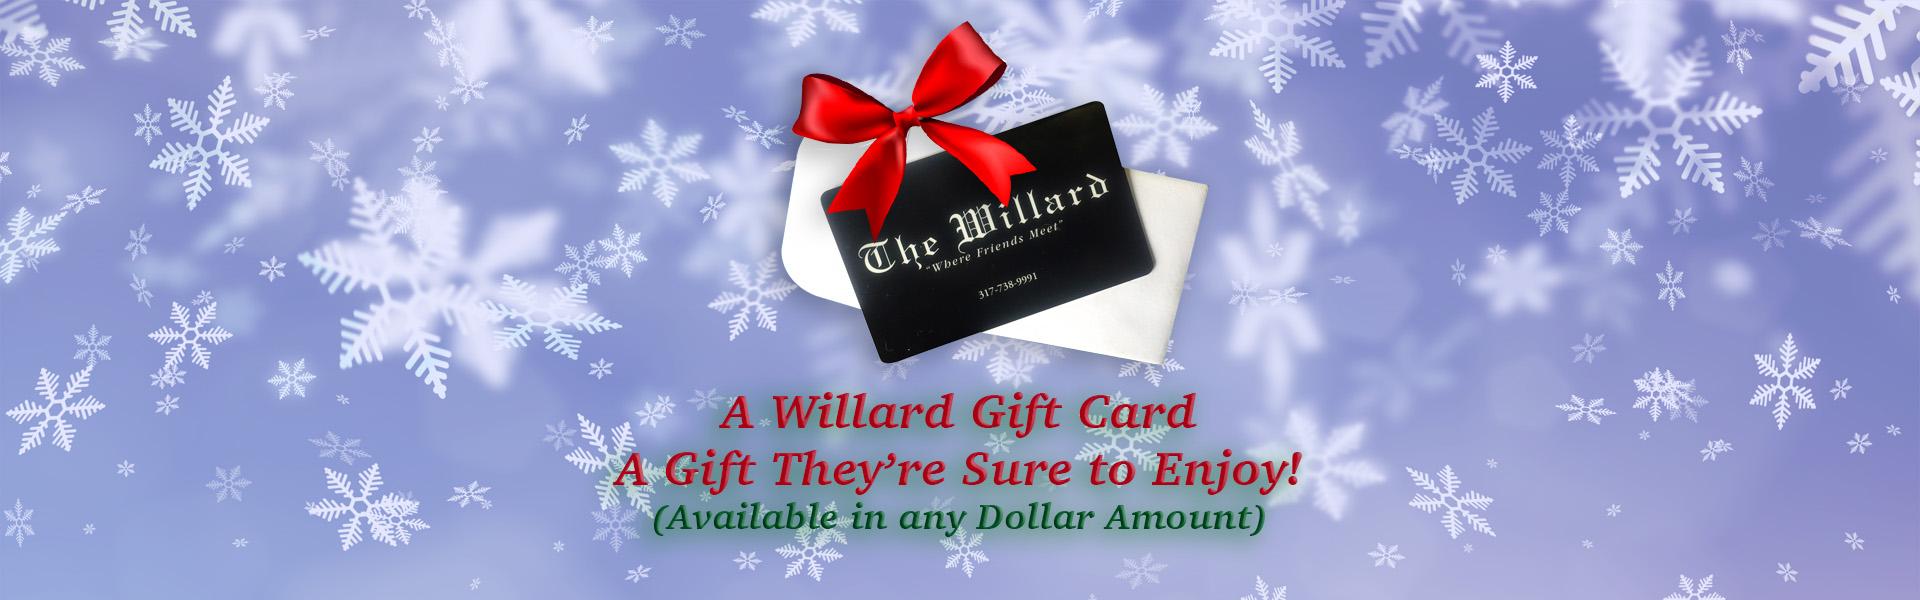 Willard_GiftCard_XMAS1